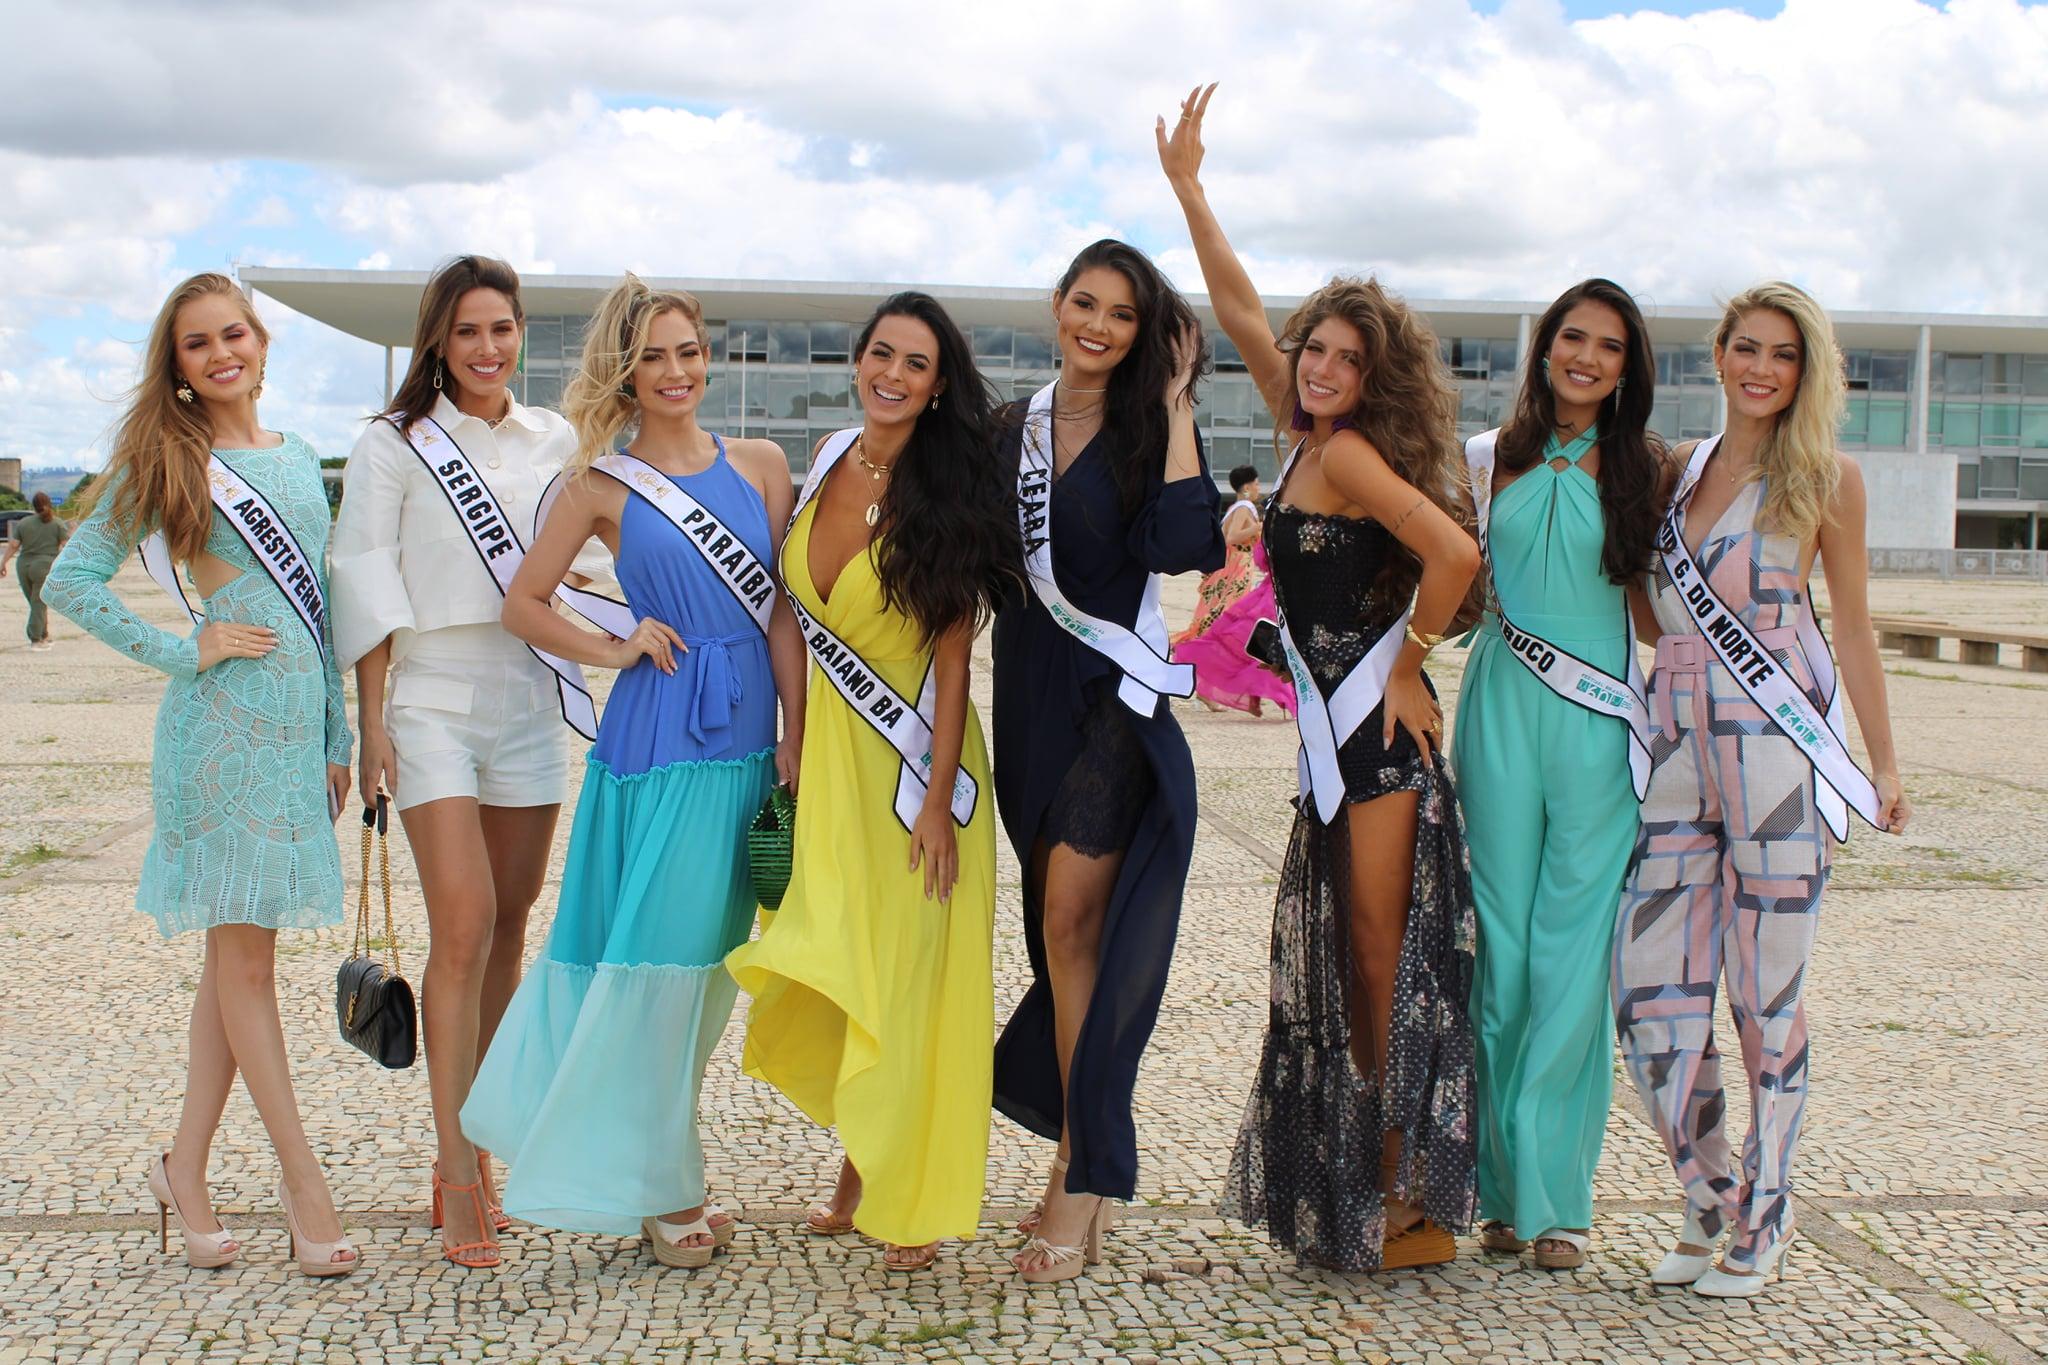 bruna zanardo, 1st runner-up de miss supranational brazil 2020/miss brasil internacional 2017/miss brasil terra 2016. - Página 17 12602411